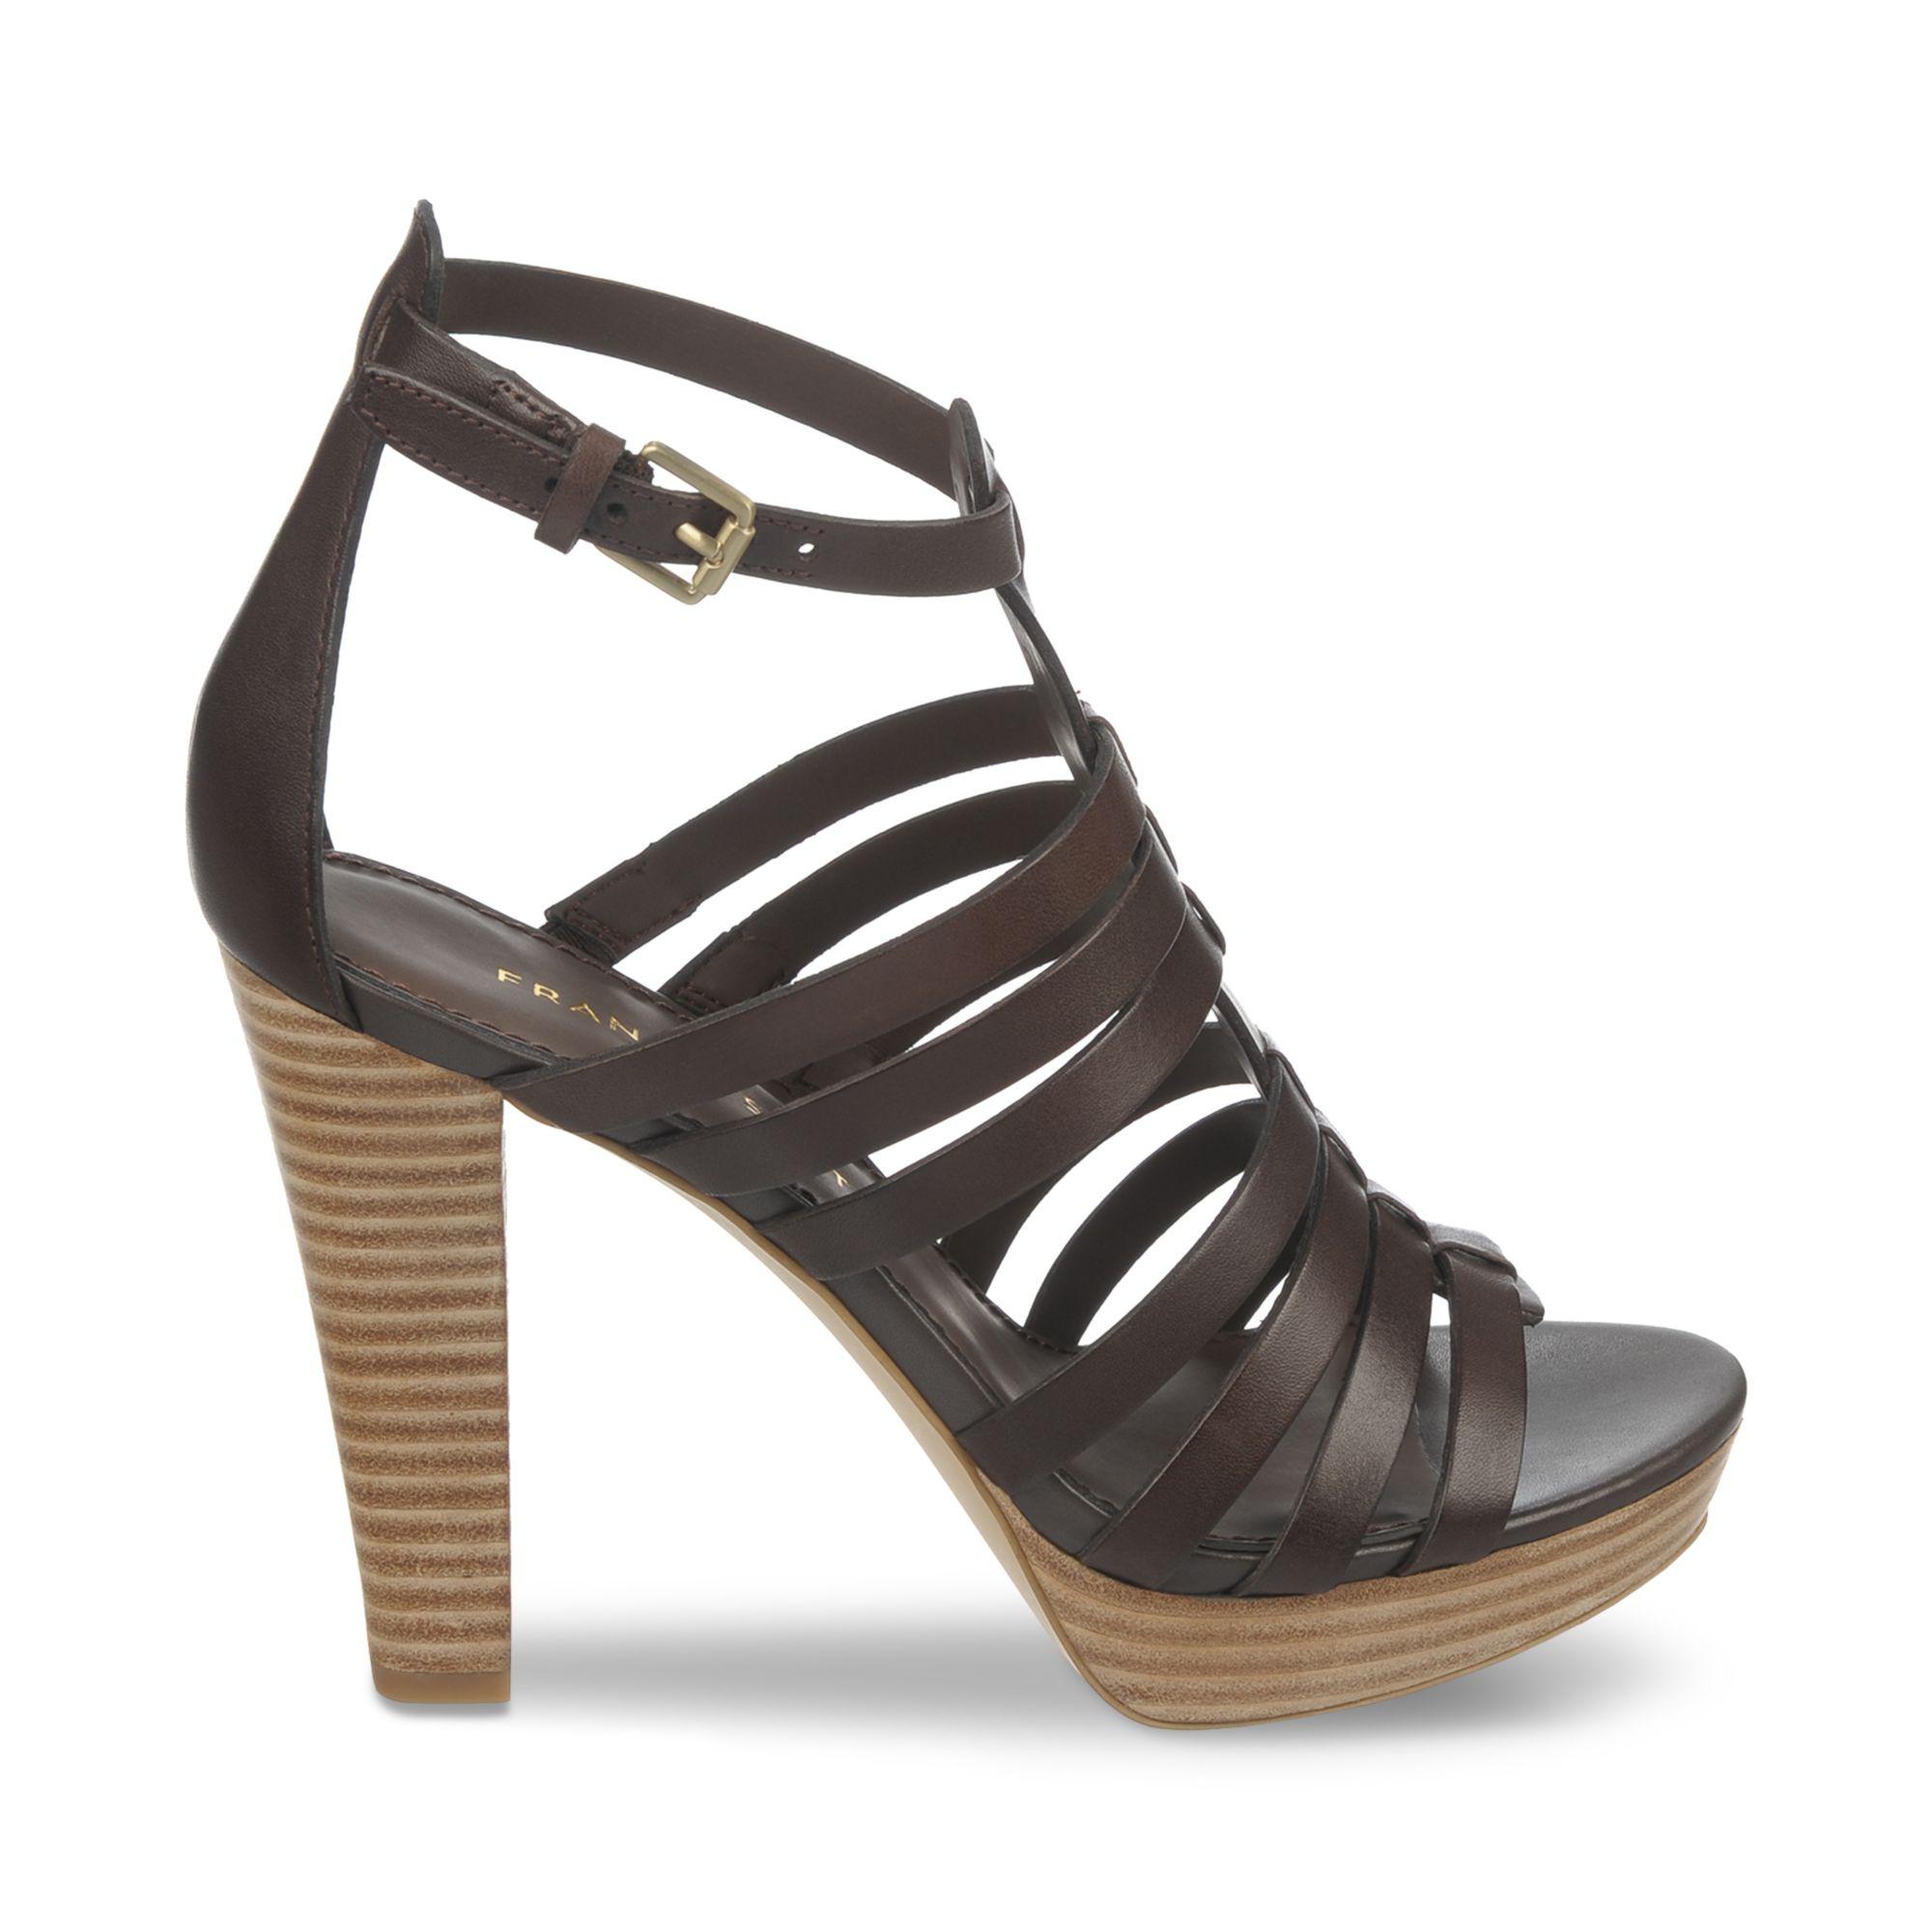 64bafff7375 Lyst - Franco Sarto Bauble Platform Gladiator Sandals in Brown